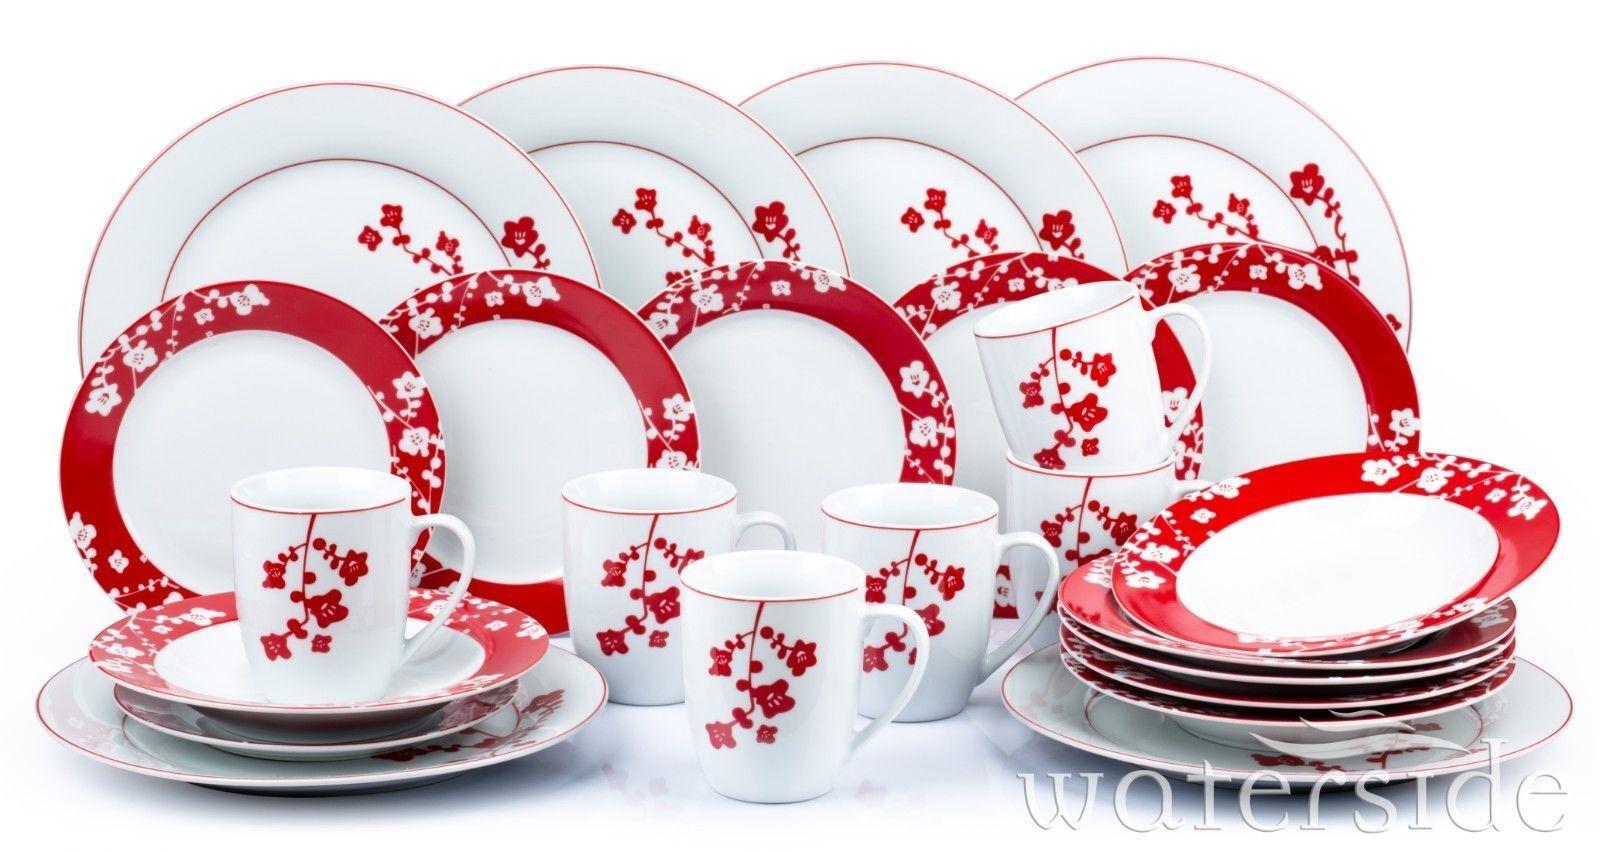 24pcs Set cena di Natale Blossom Rosso Bianco Stoviglie Stoviglie 6 coperto